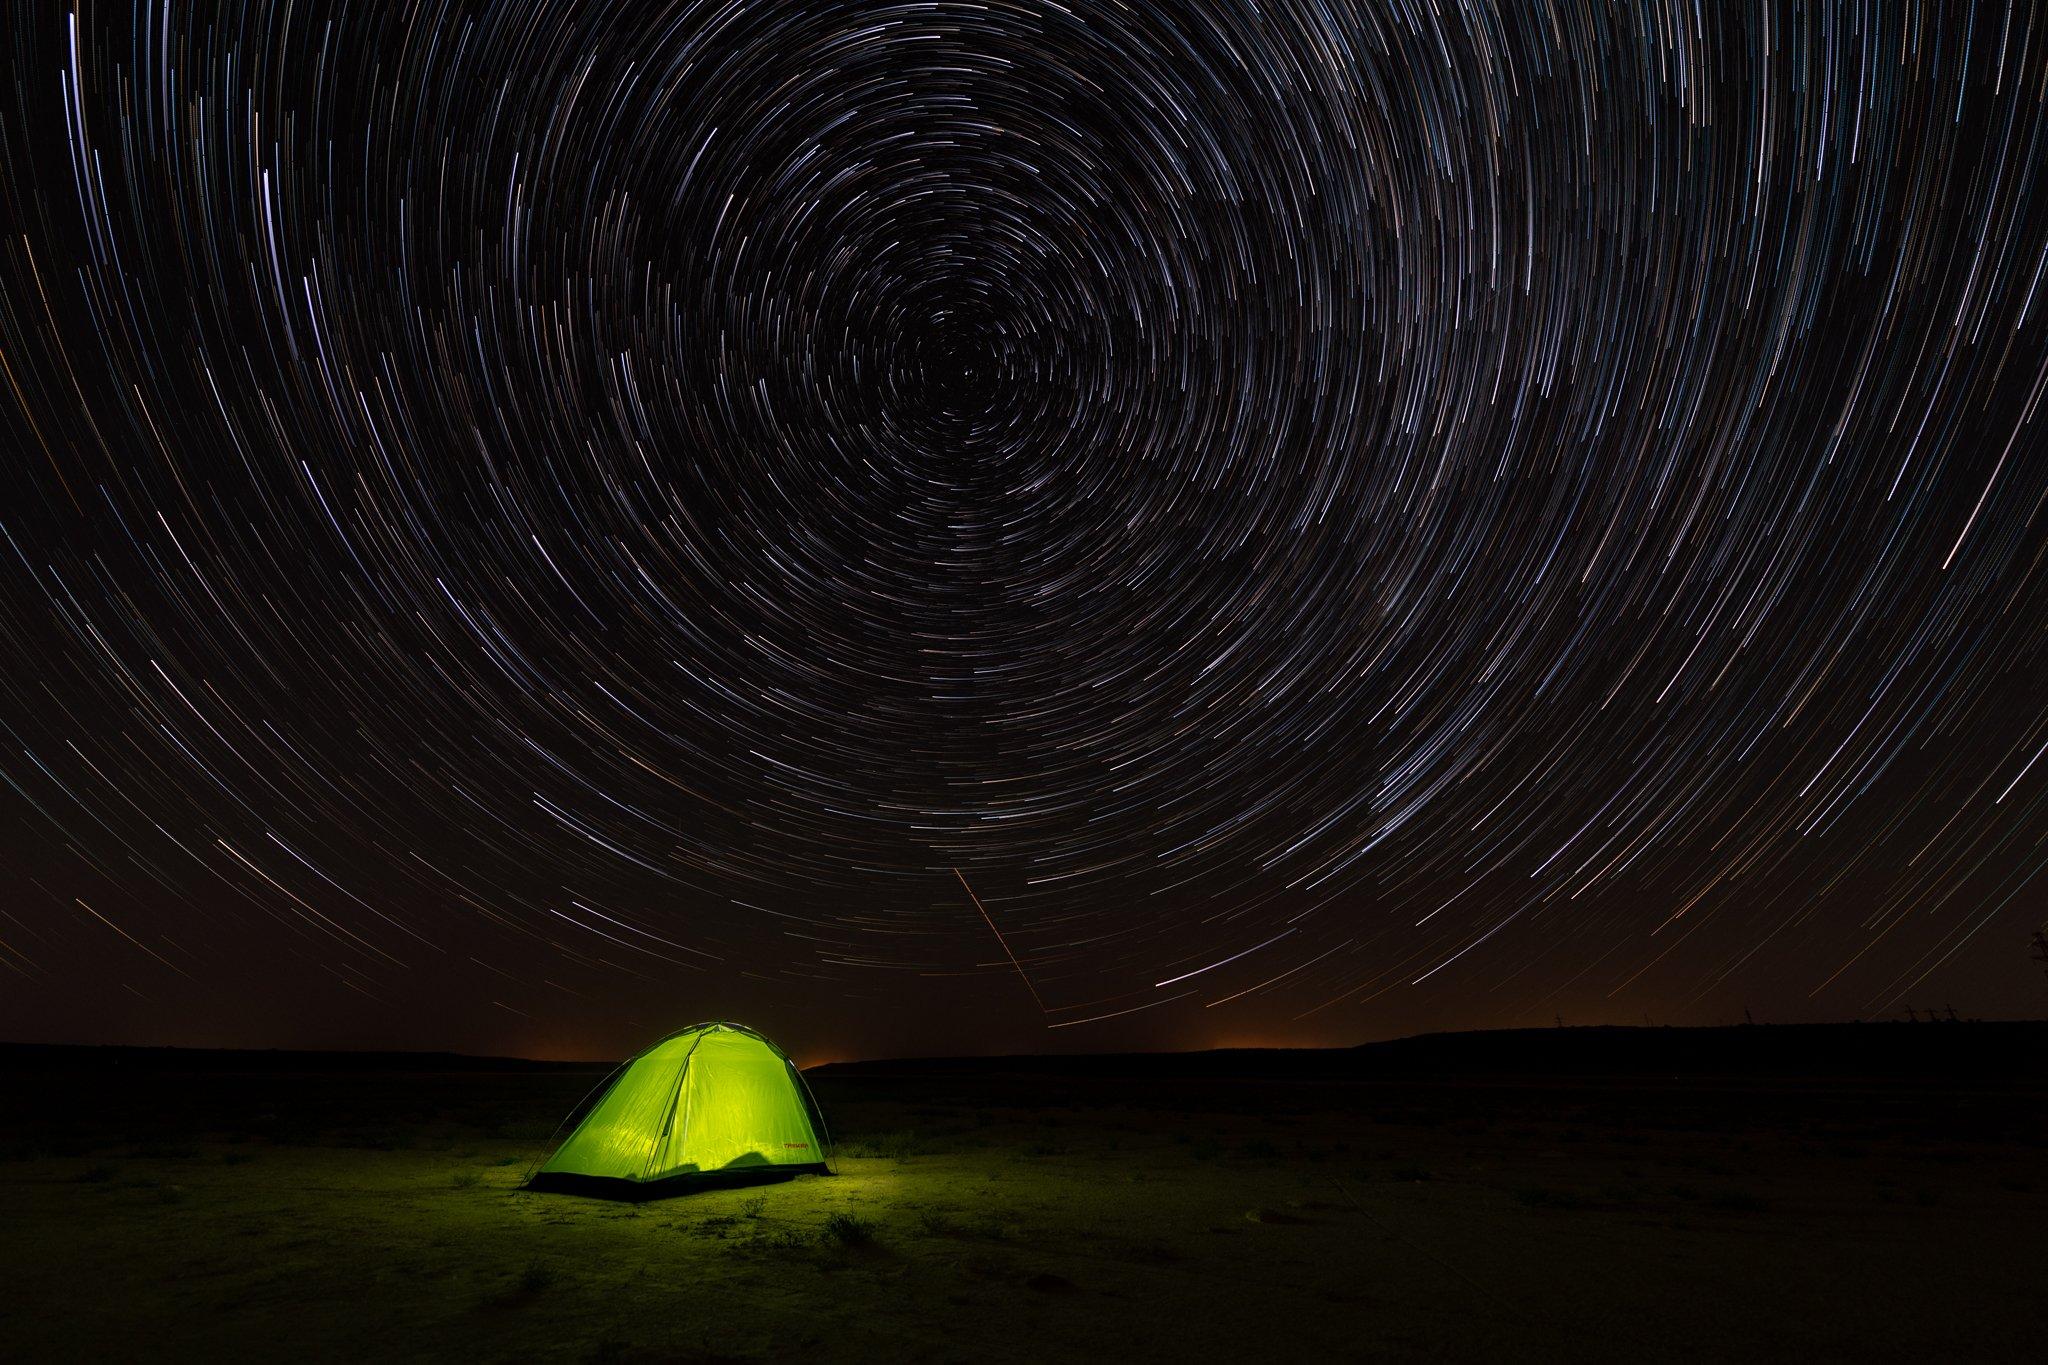 меркулов, николай меркулов, nmerkulov, nmerkulovphotography, пейзаж, ночь, ночной пейзаж, звезды, звездные треки, стартрейлы, палатка, night, nightscape, startrails, tent, landscape, никон, nikon, d850, Николай Меркулов